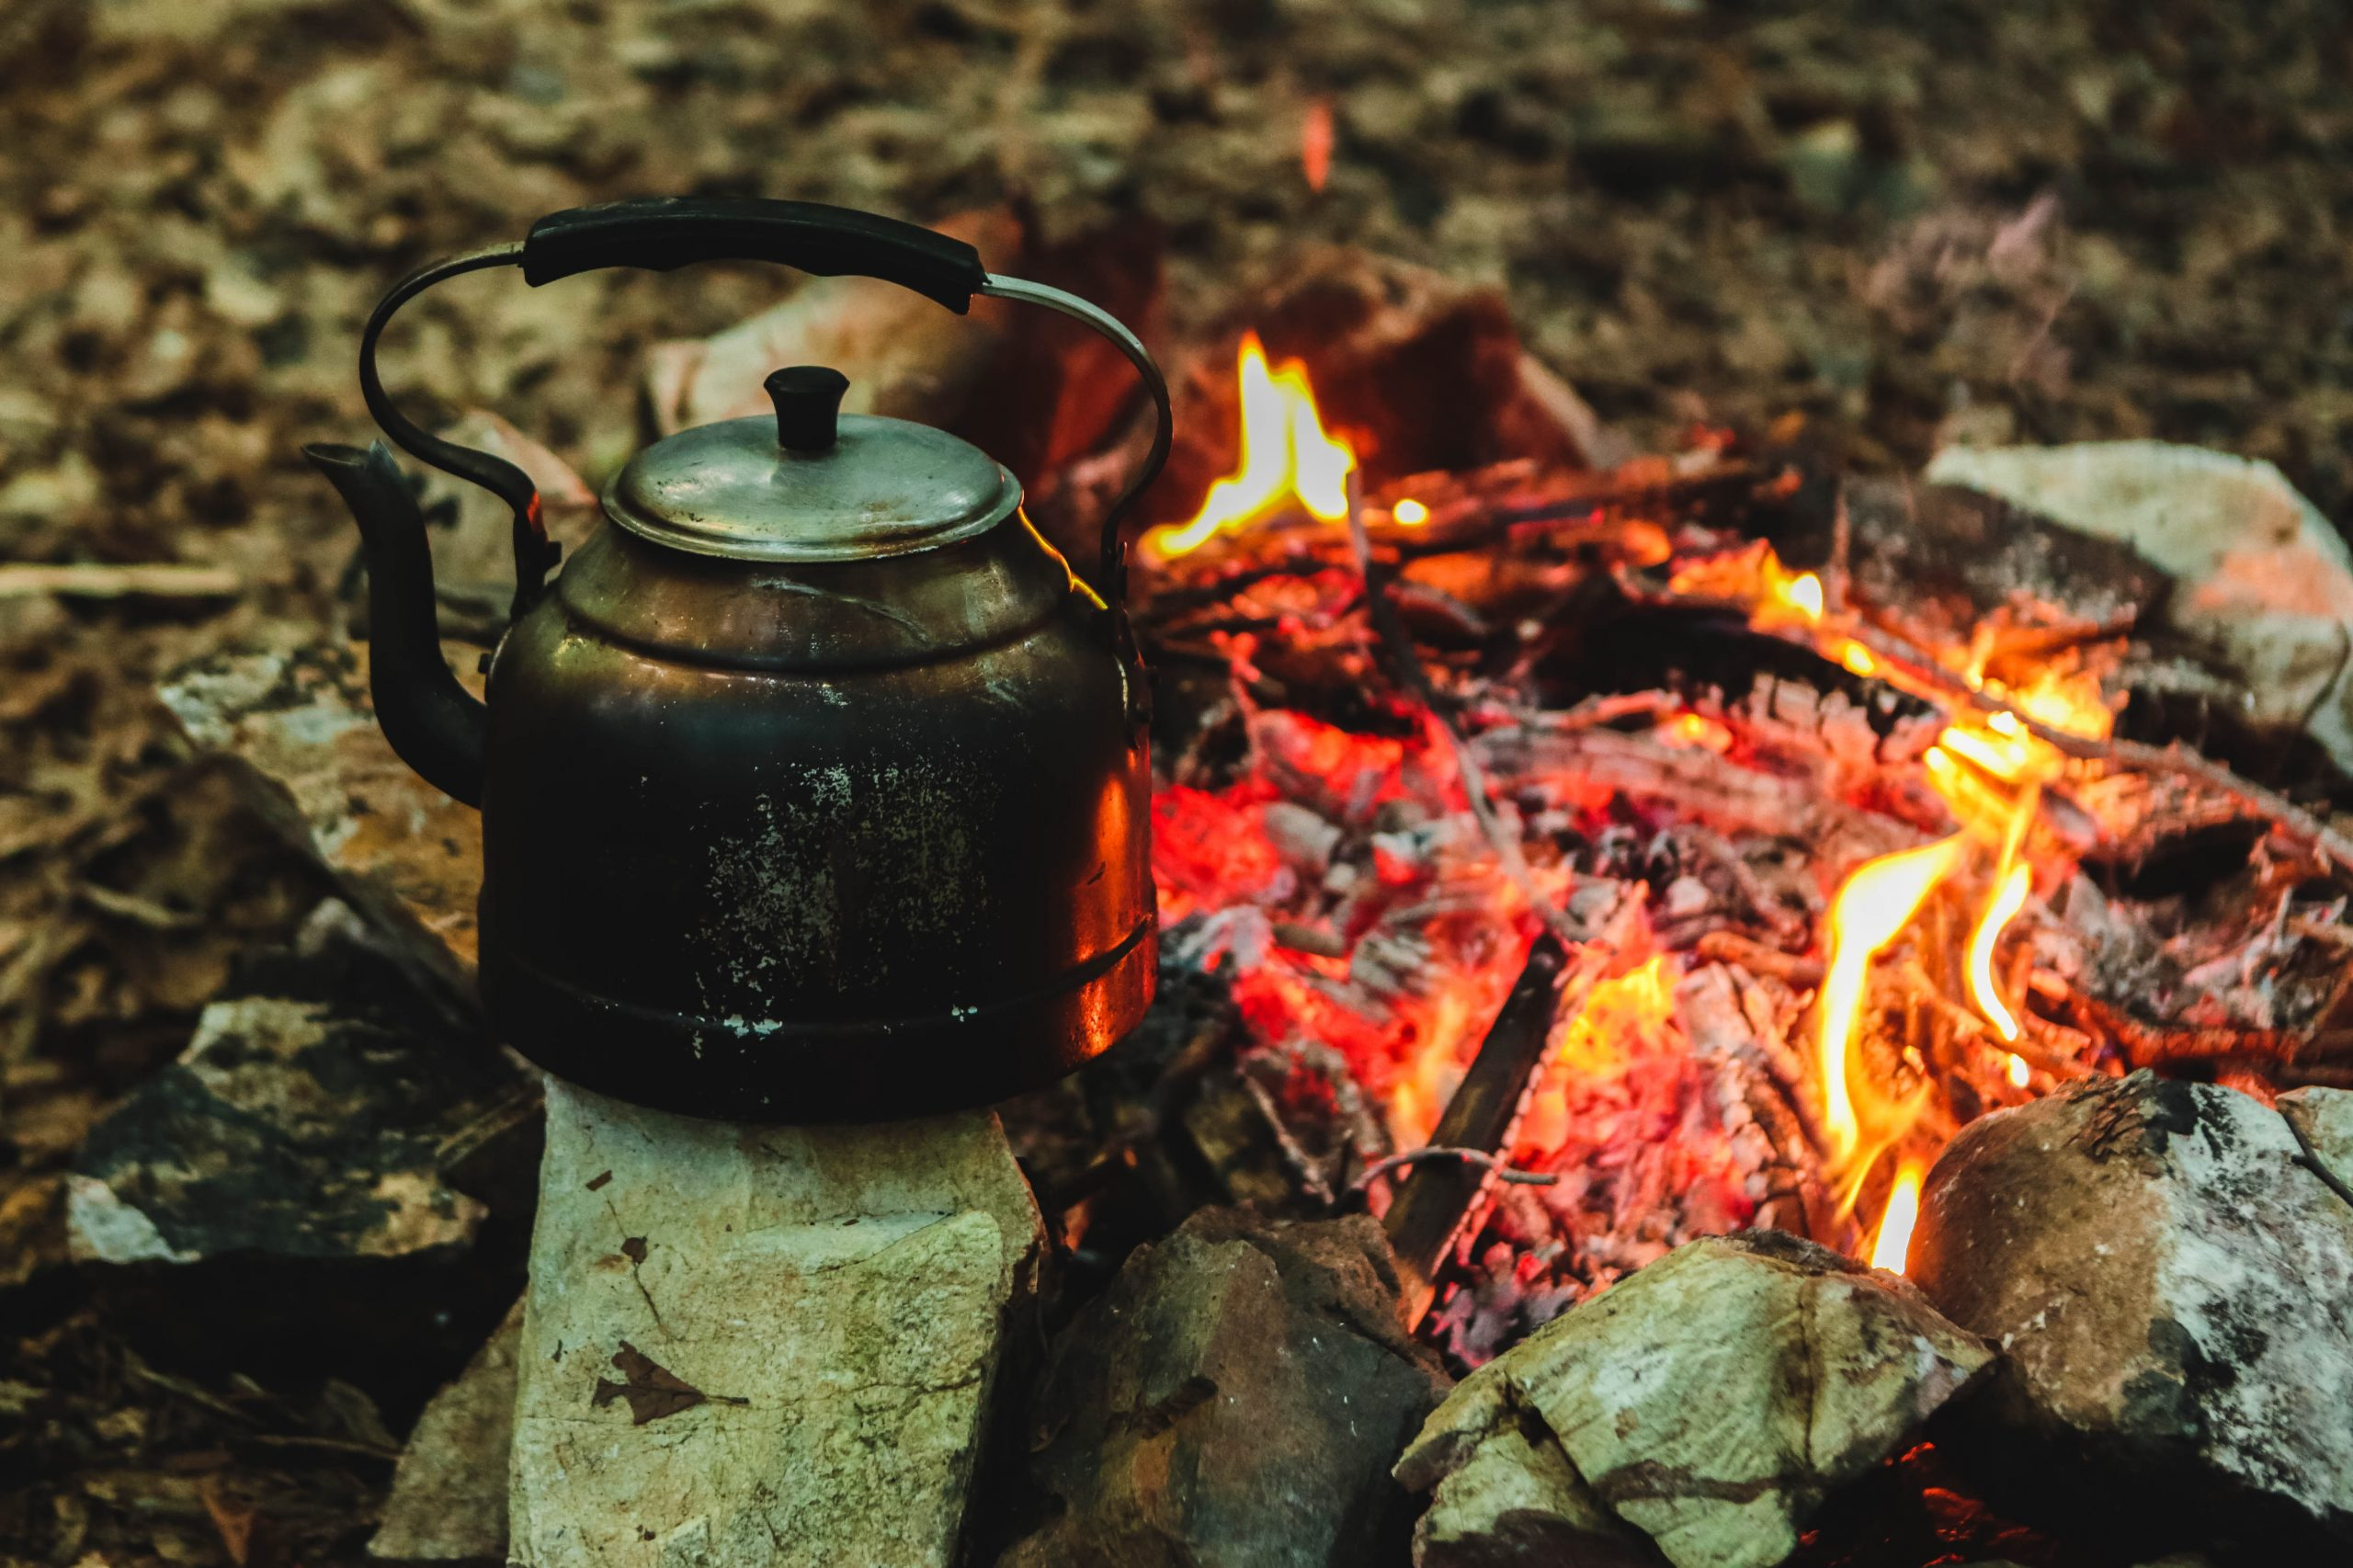 Camping tea